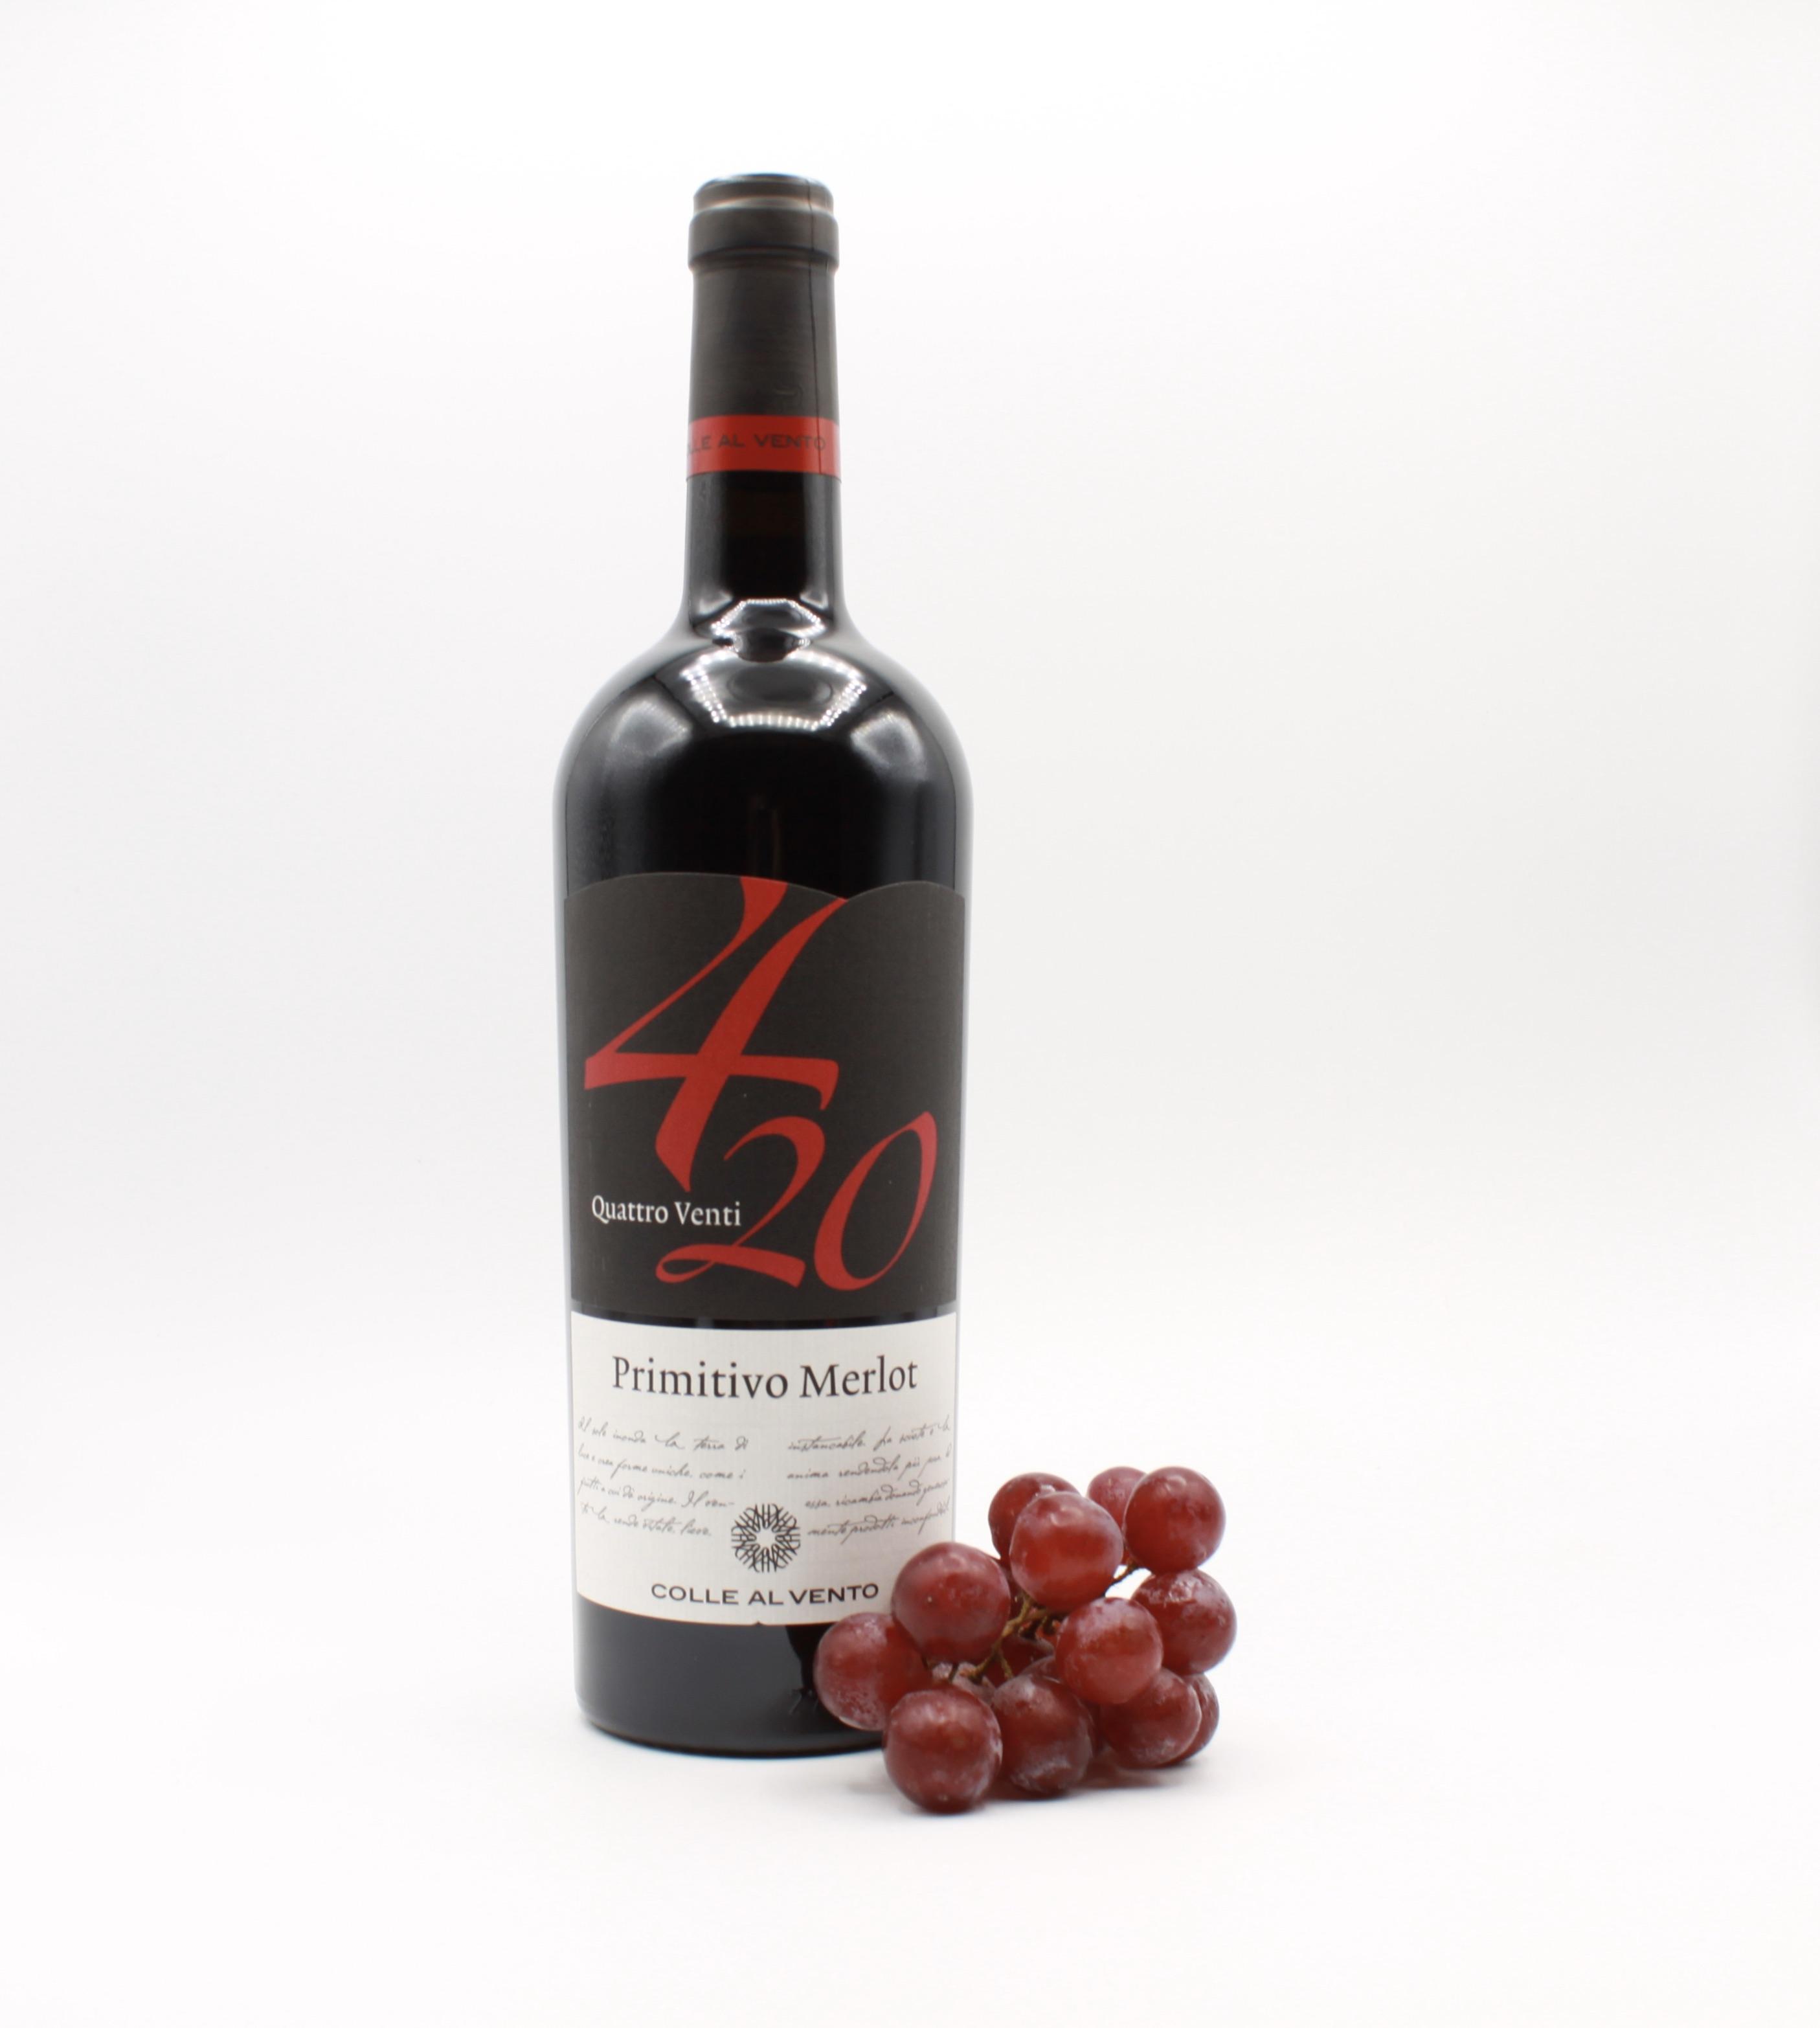 Primitivo Merlot IGP 4/20 - Colle al Vento, Italienischer Rotwein